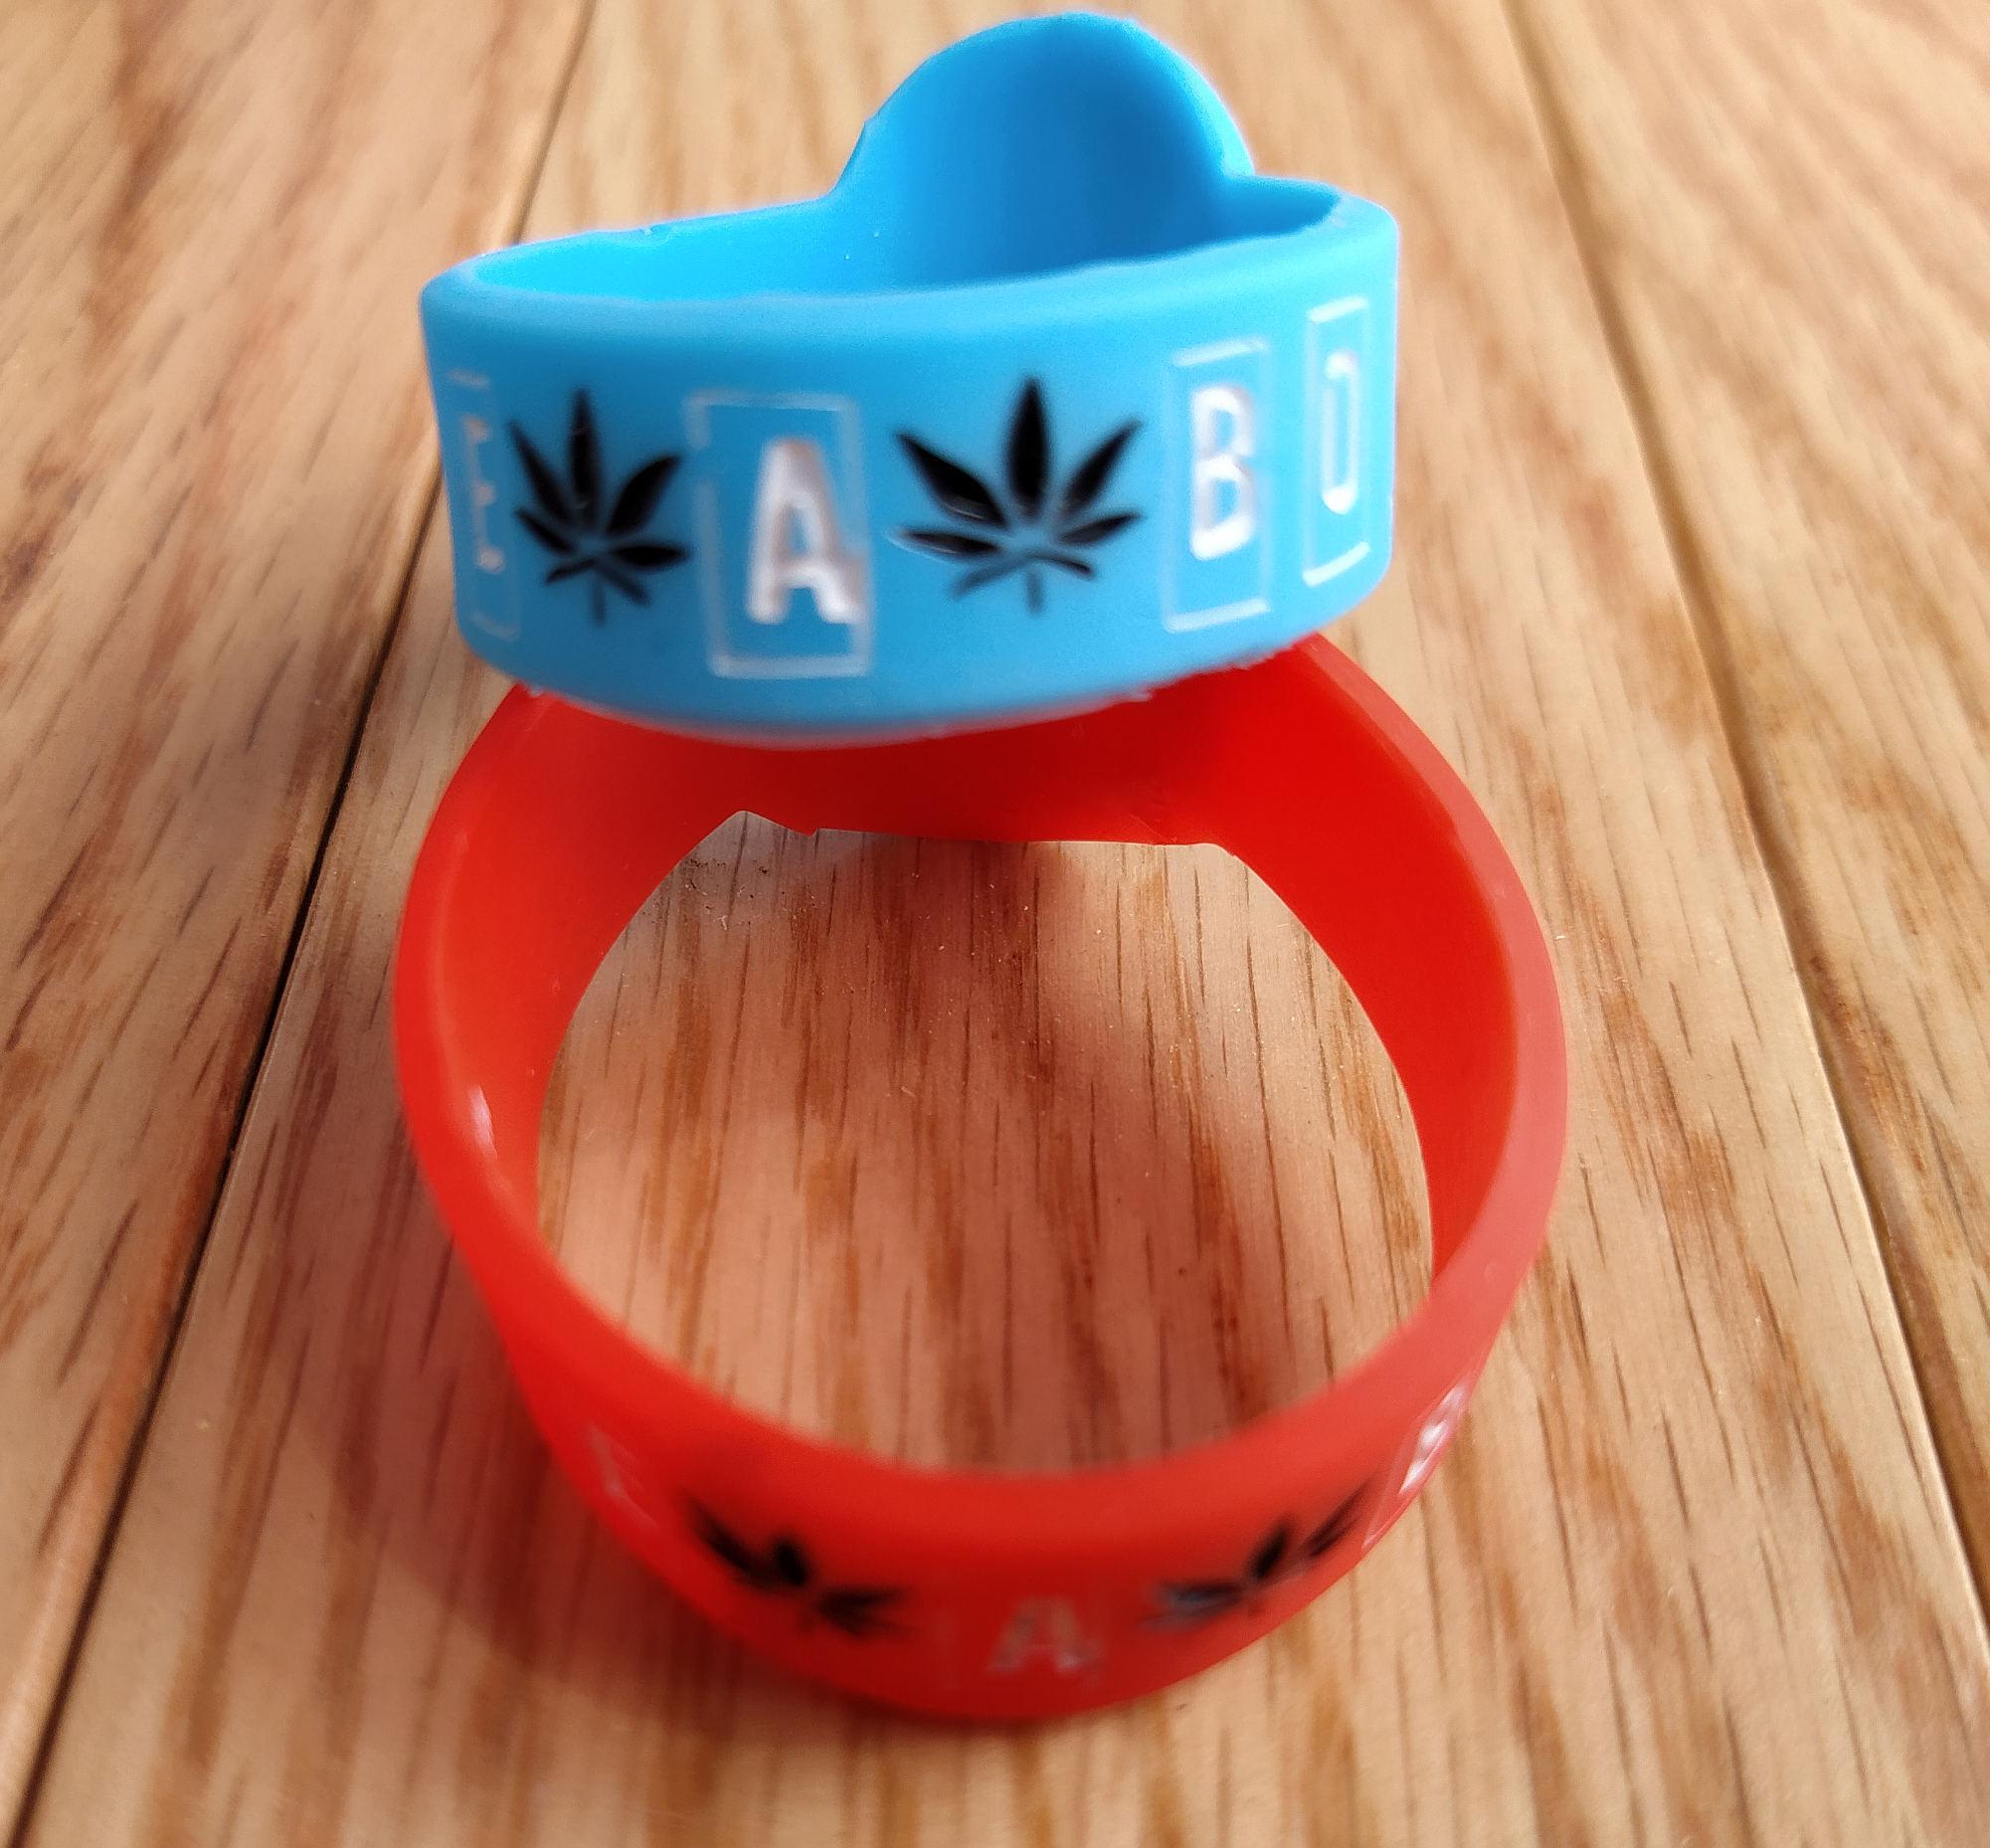 marijuana leaf save-a-bowl product picture